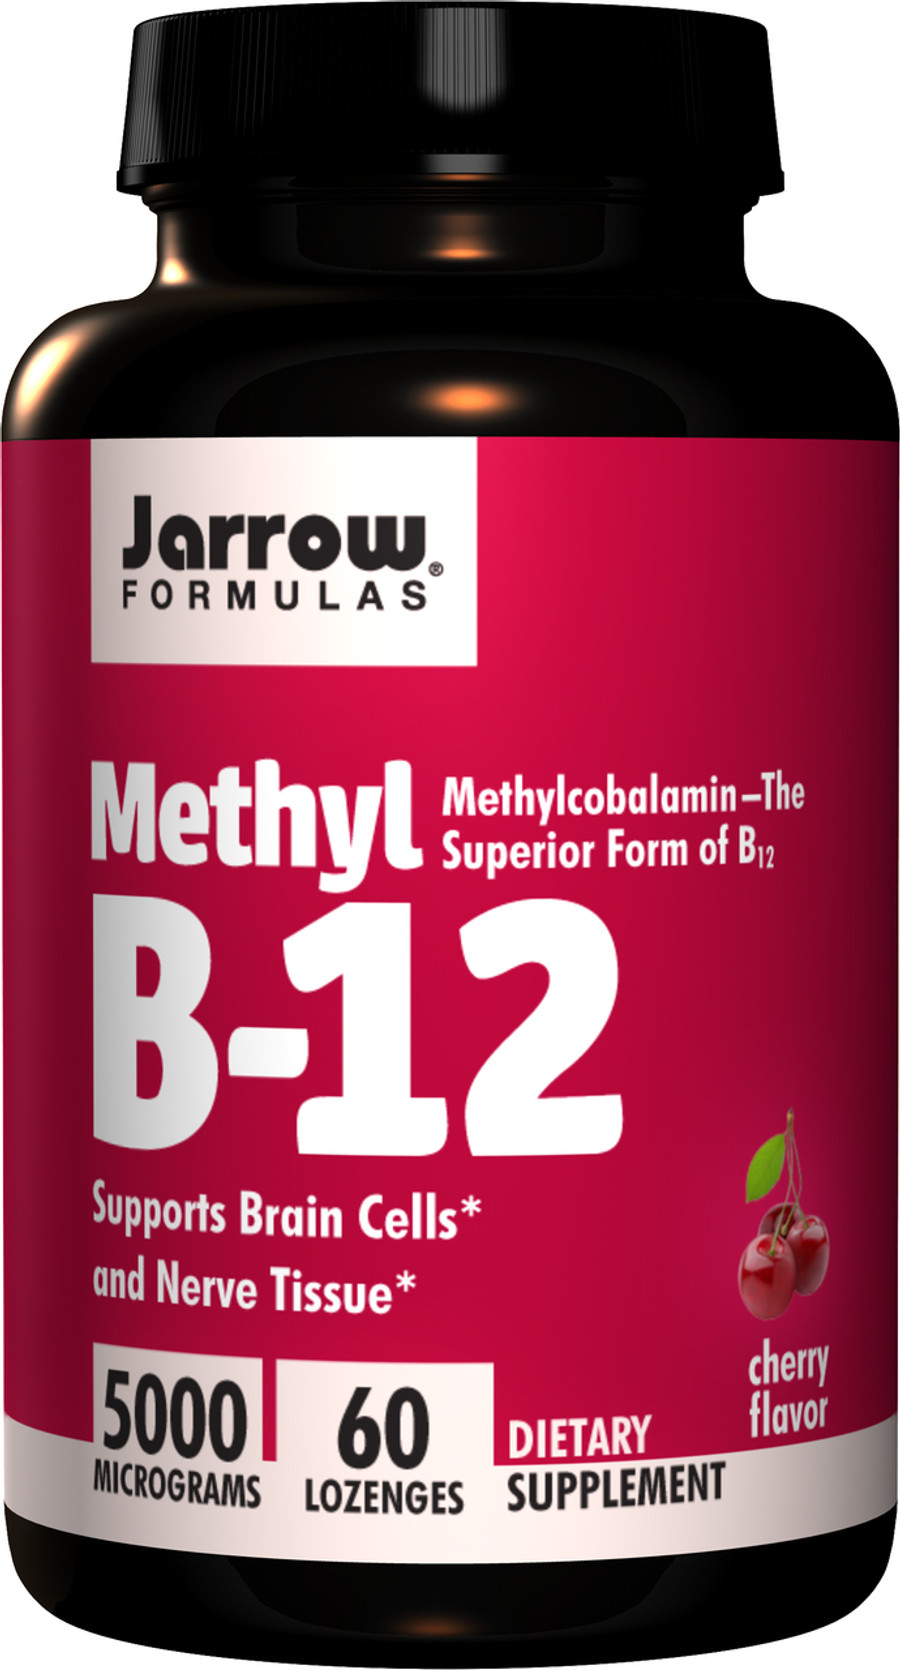 Methyl B-12 5000, 60 lozenges